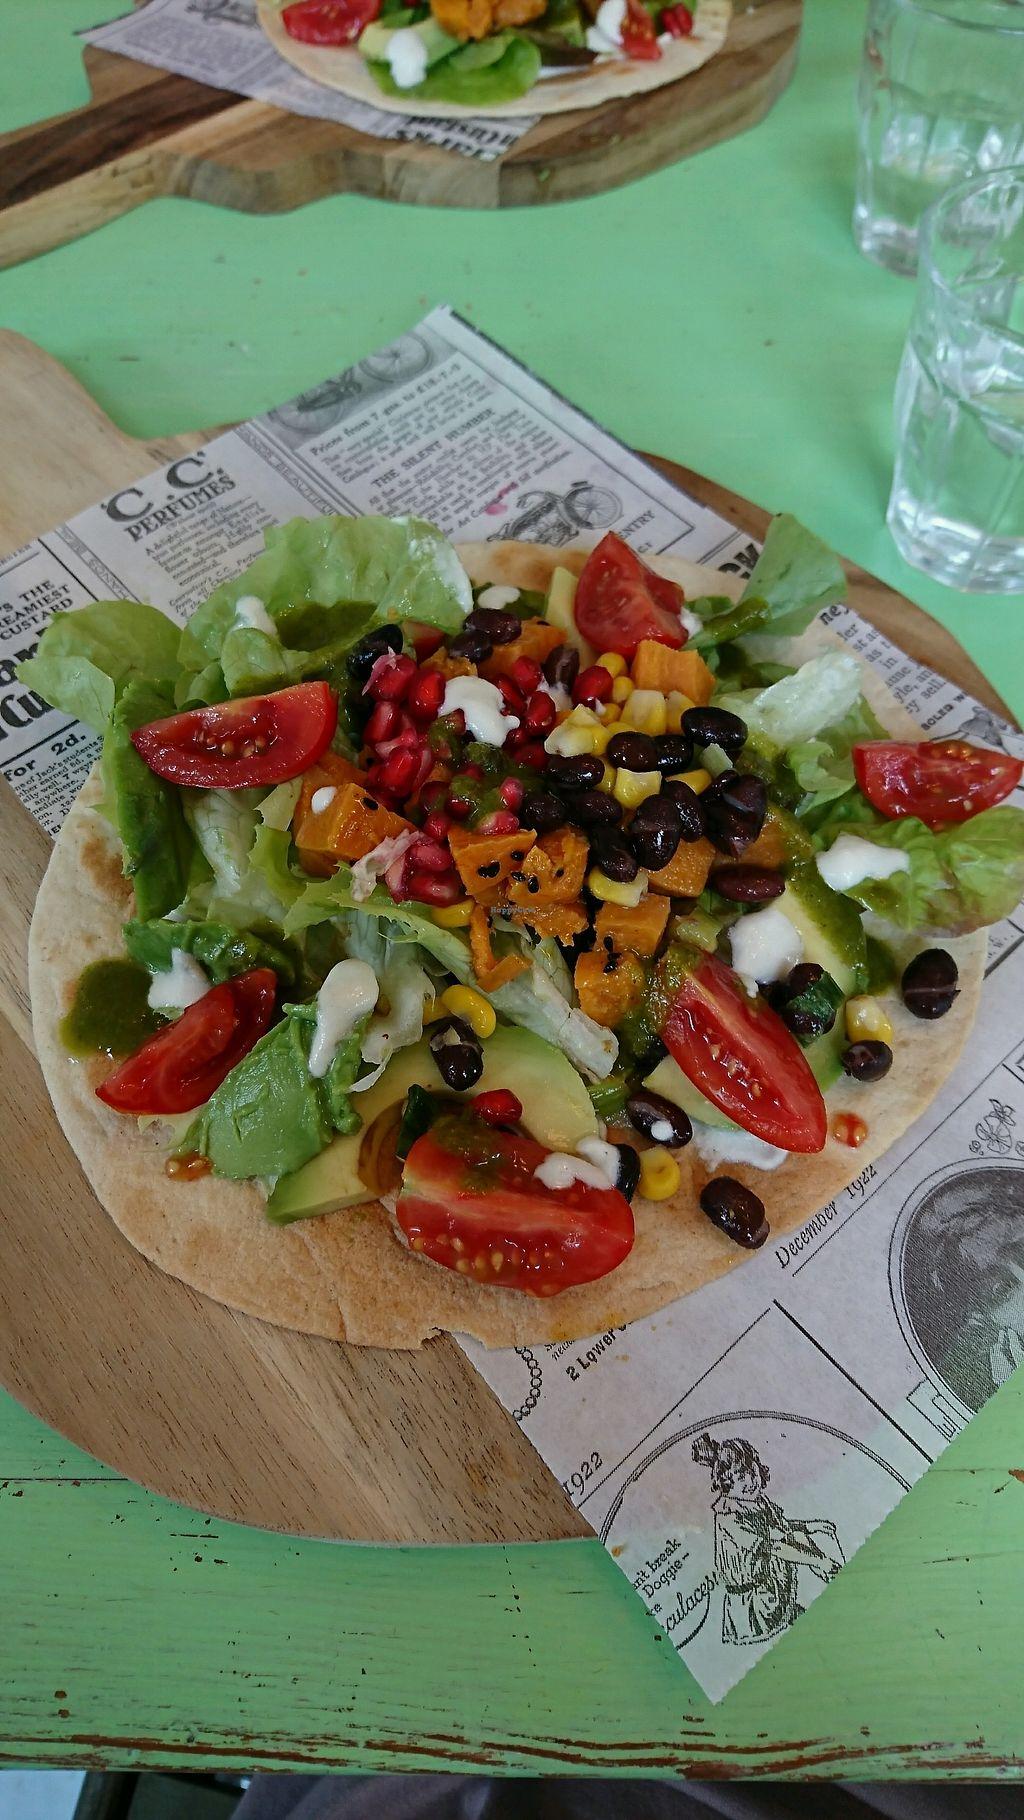 "Photo of The Green Kitchen  by <a href=""/members/profile/JohannaMiettinen"">JohannaMiettinen</a> <br/>Vegan tortilla <br/> September 19, 2017  - <a href='/contact/abuse/image/73597/306012'>Report</a>"